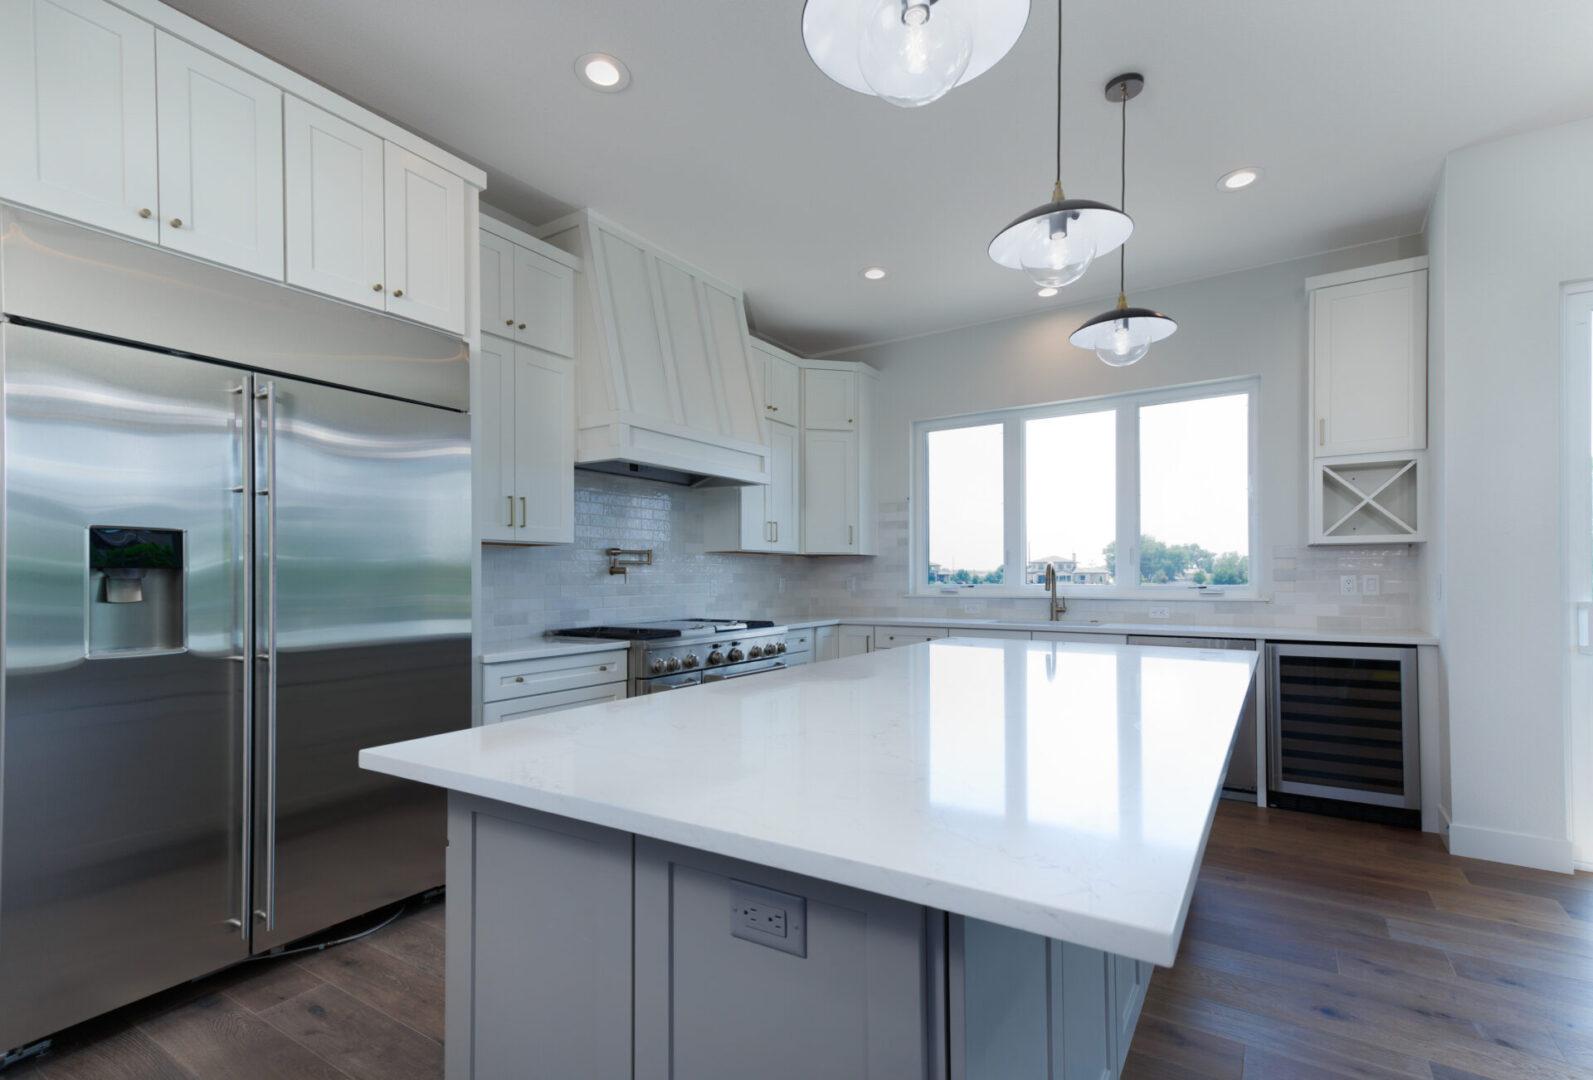 white-themed kitchen with white countertop